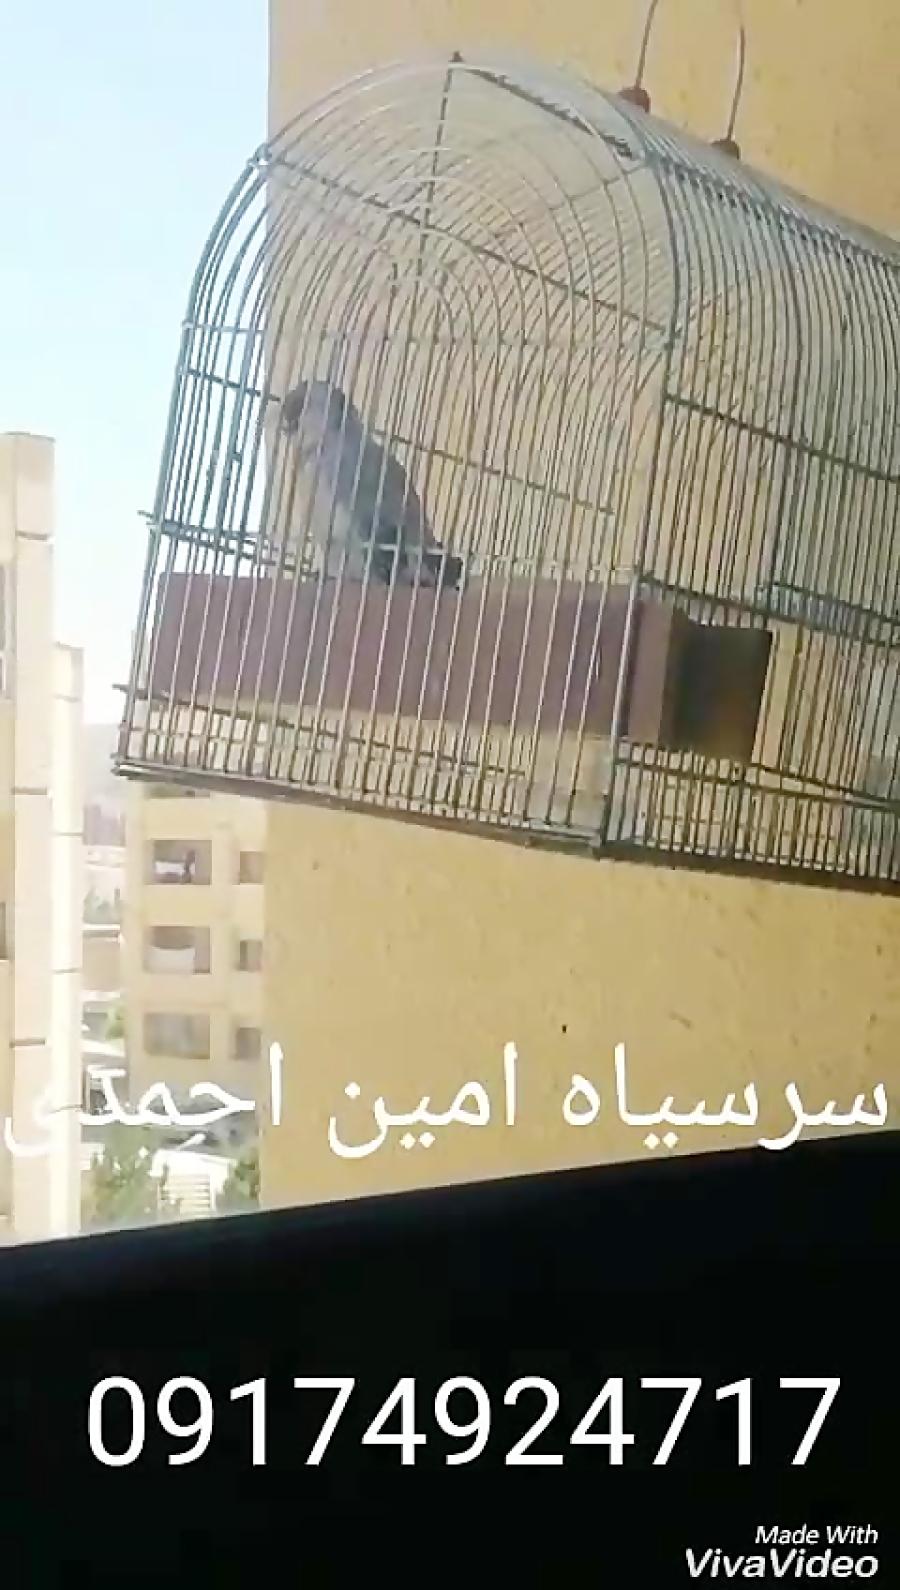 80b64ee03 فیلم: سهره طوق دار / ویدیو کلیپ | پرشین ناز